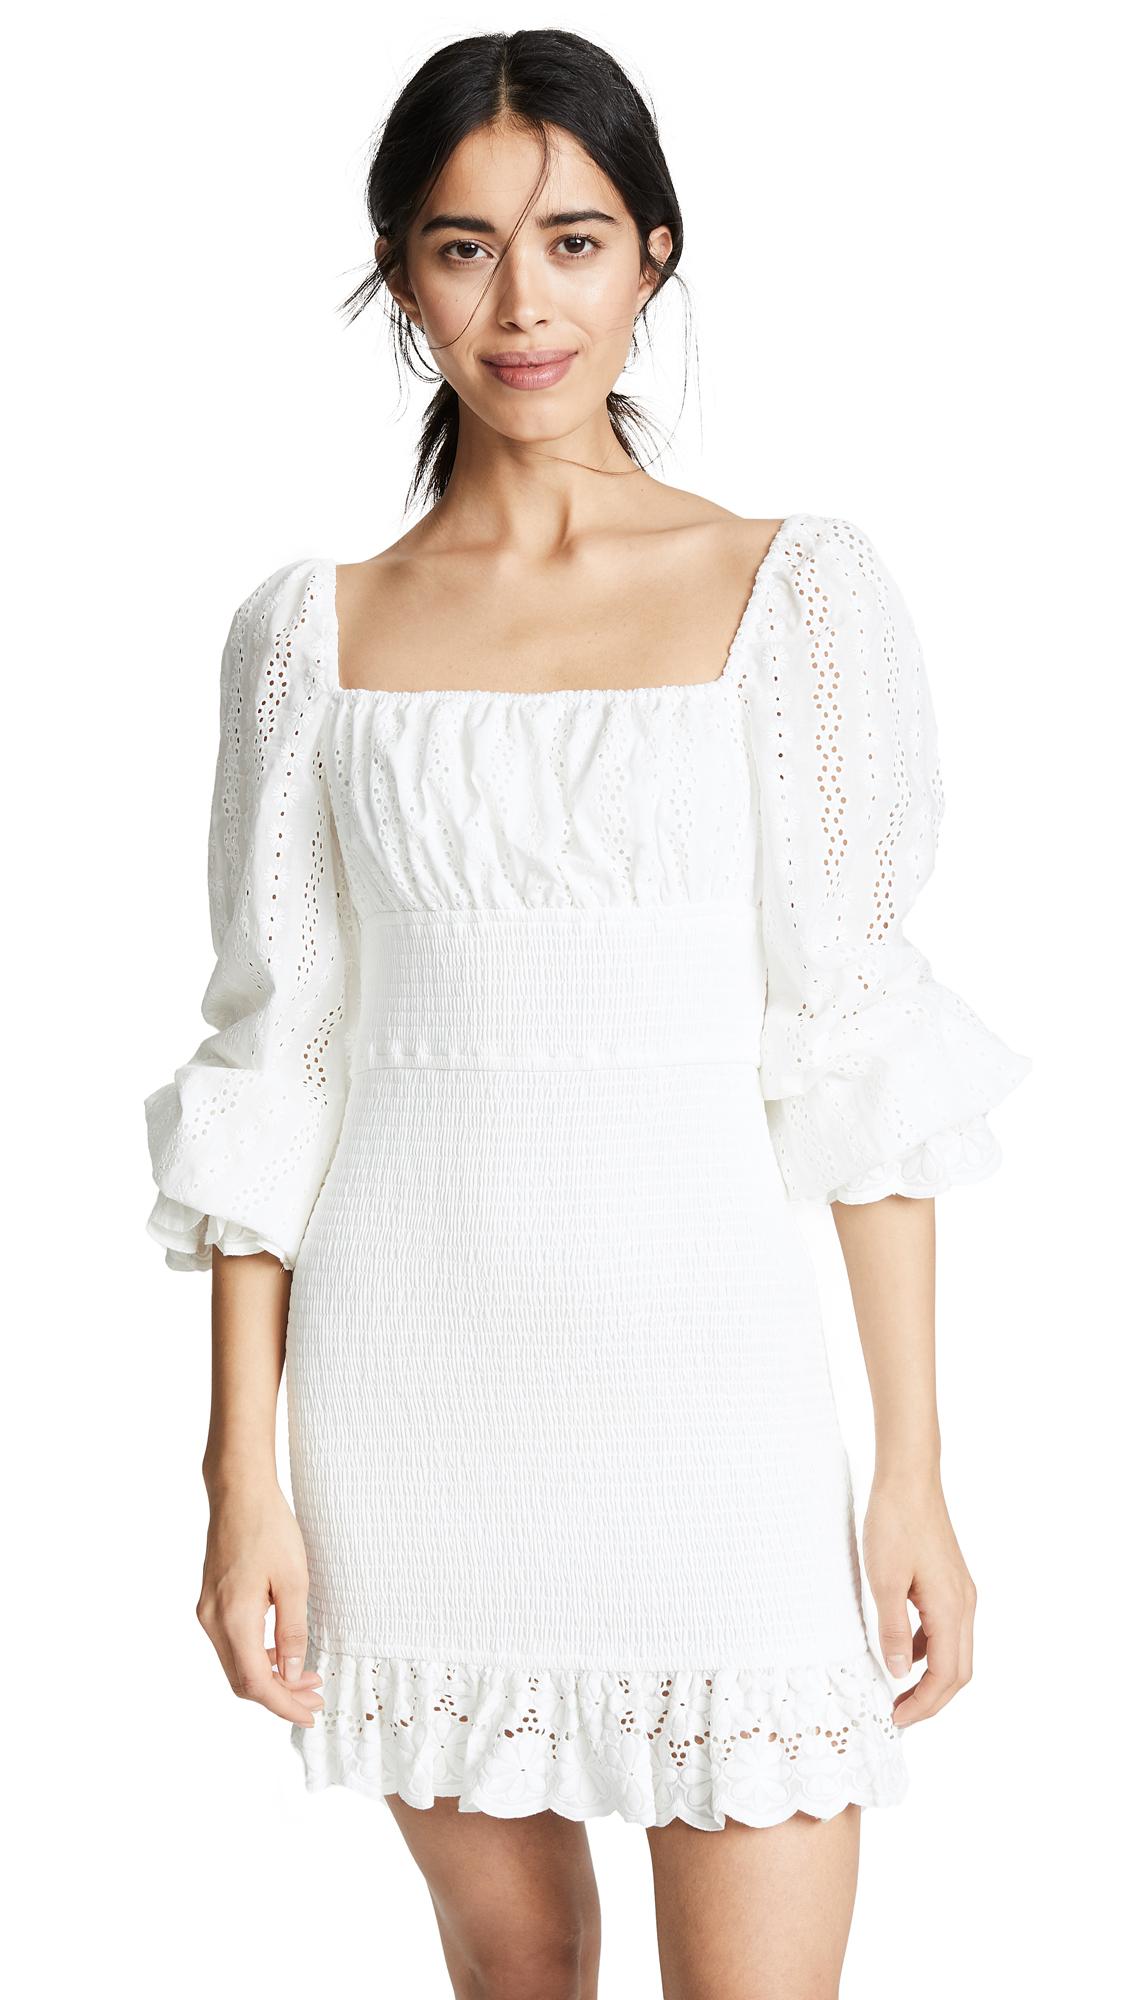 FINDERS KEEPERS Honeysuckle Dress in Ivory